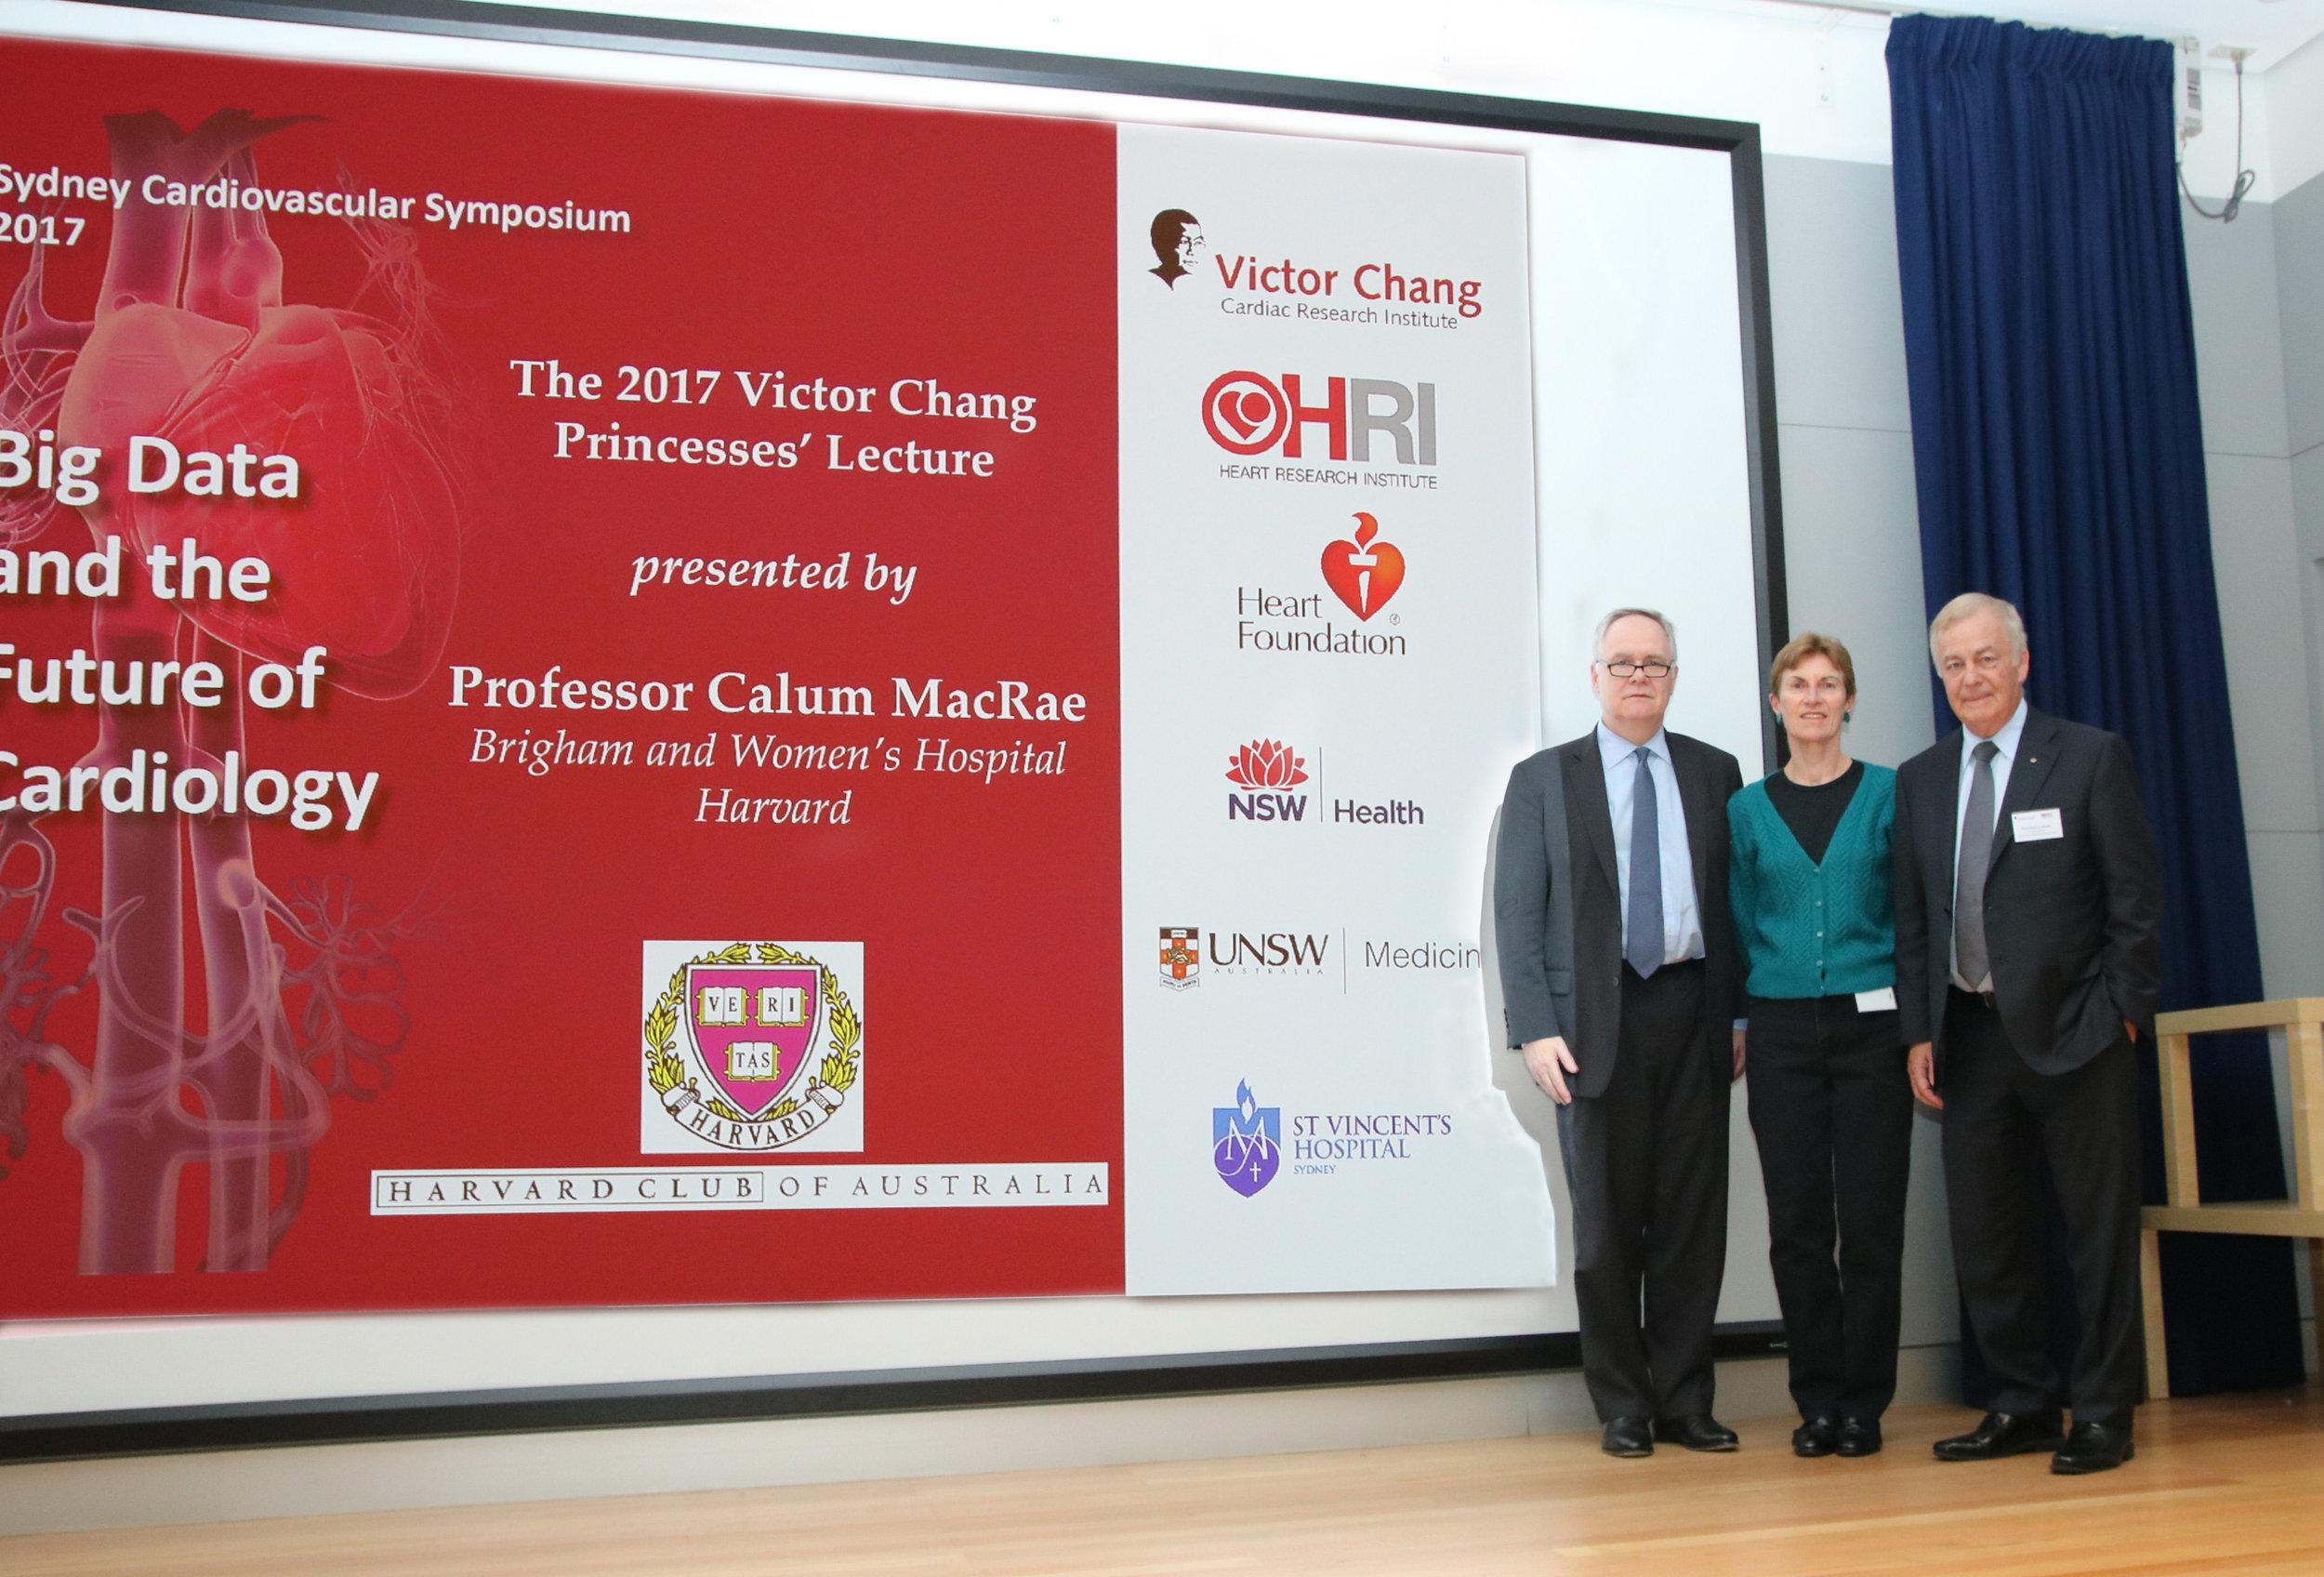 Photo : (l-r) Professors Calum Macrae (HMS), Diane Fatkin (VCCRI), Bob Graham AO (VCCRI)  [Photo courtesy of VCCRI]